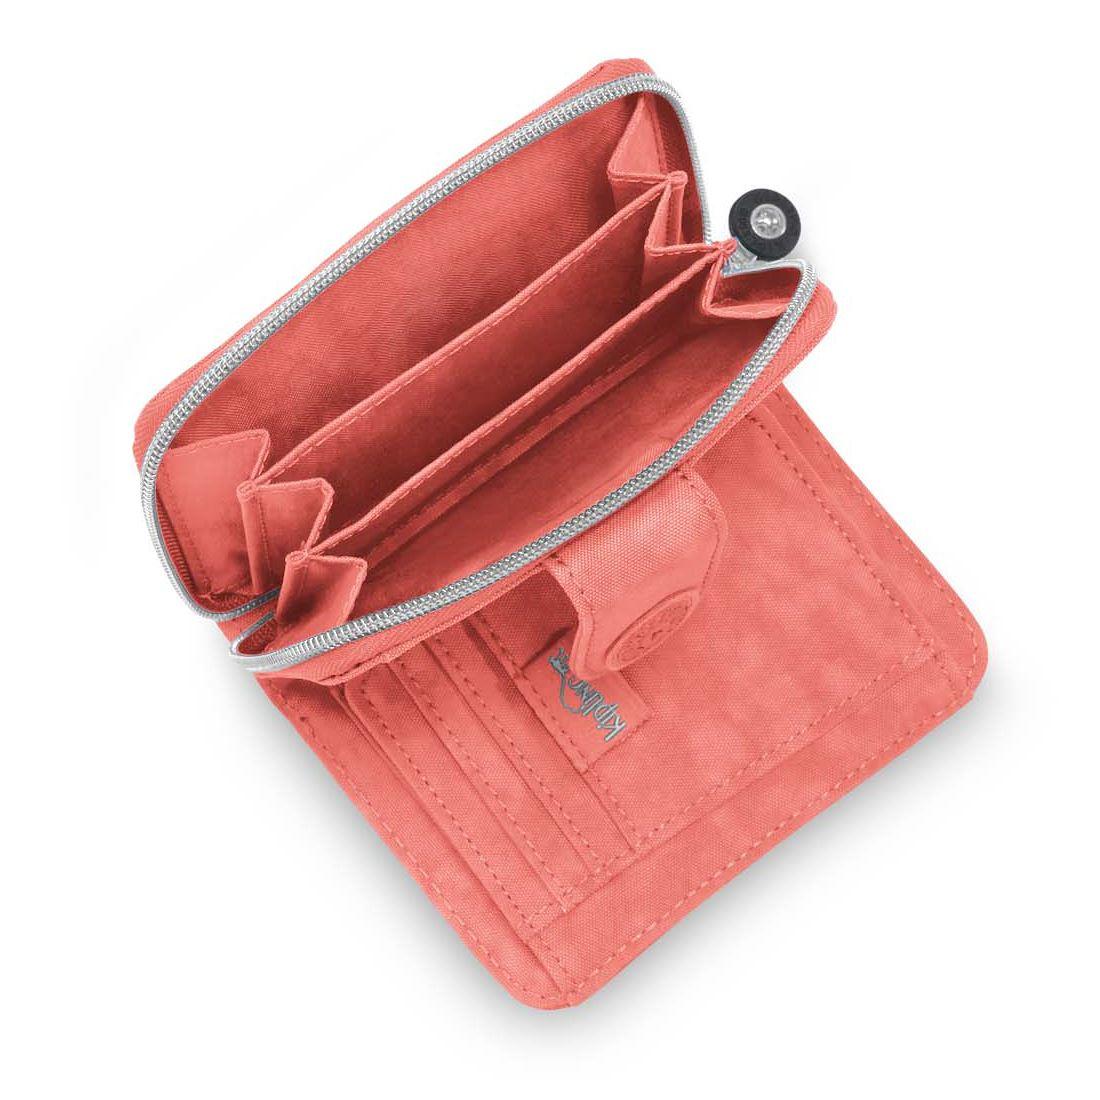 kipling new money medium ladies womens wallet purse